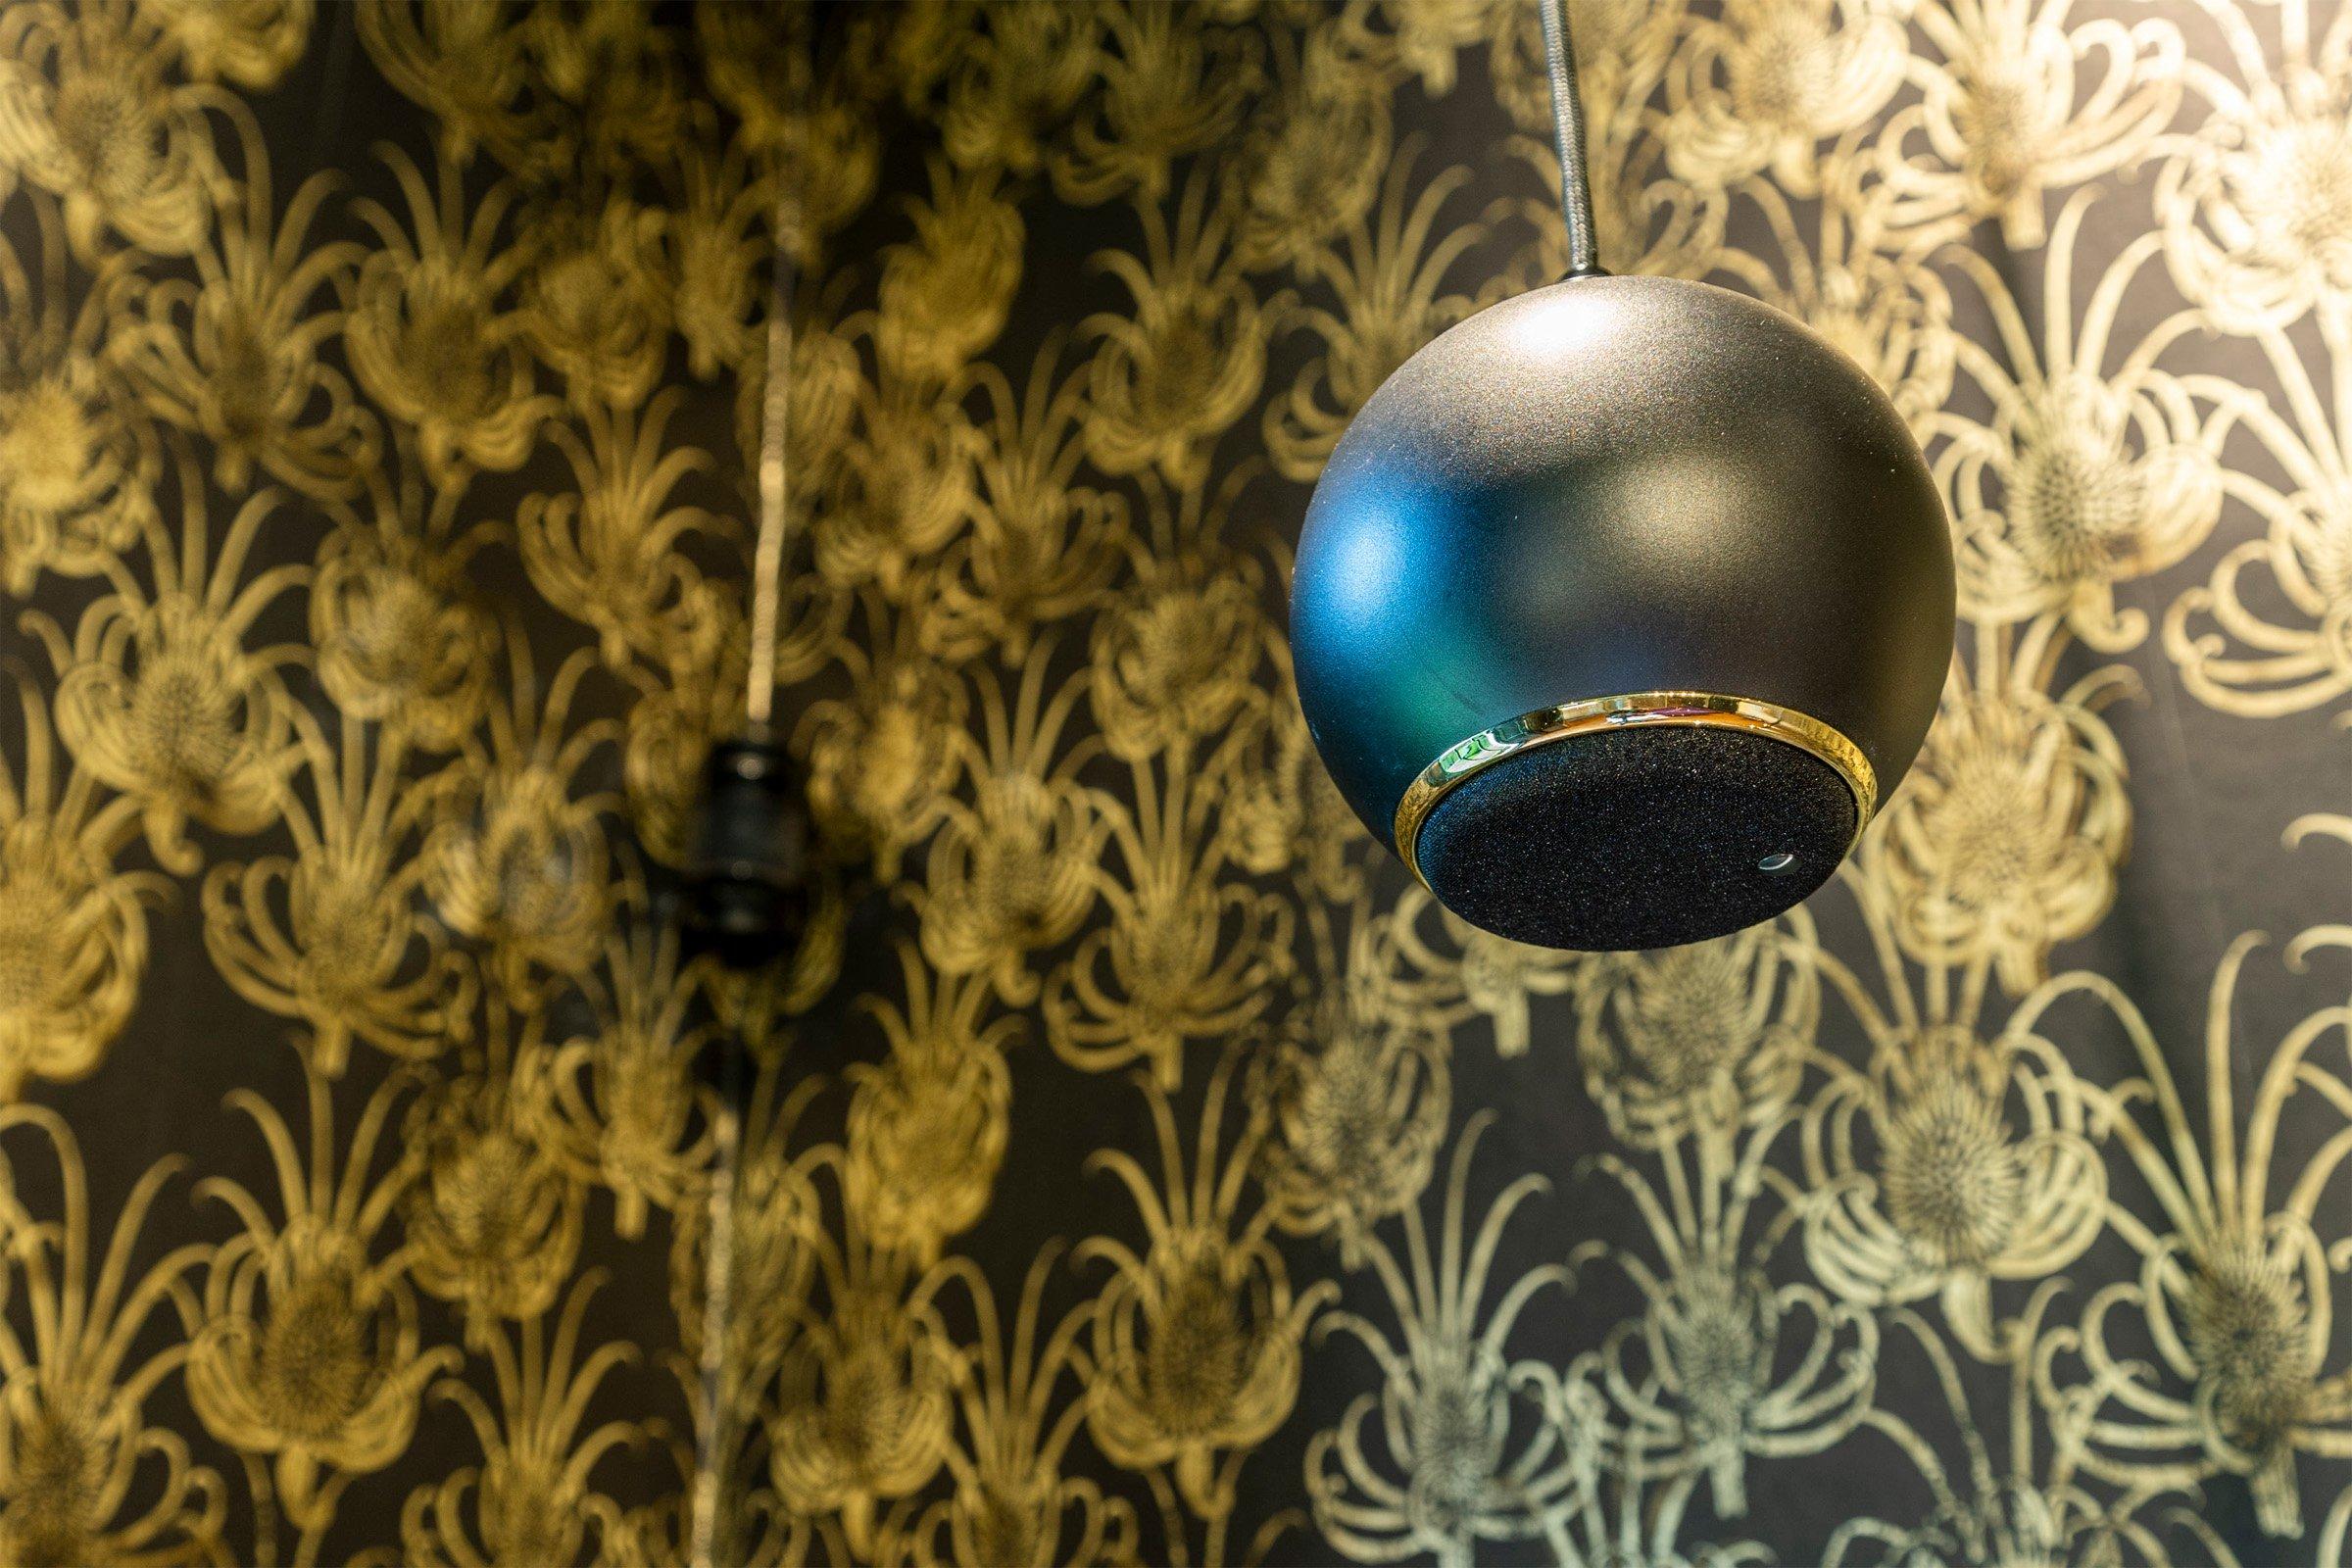 Gallo Acoustics bespoke droplet speaker